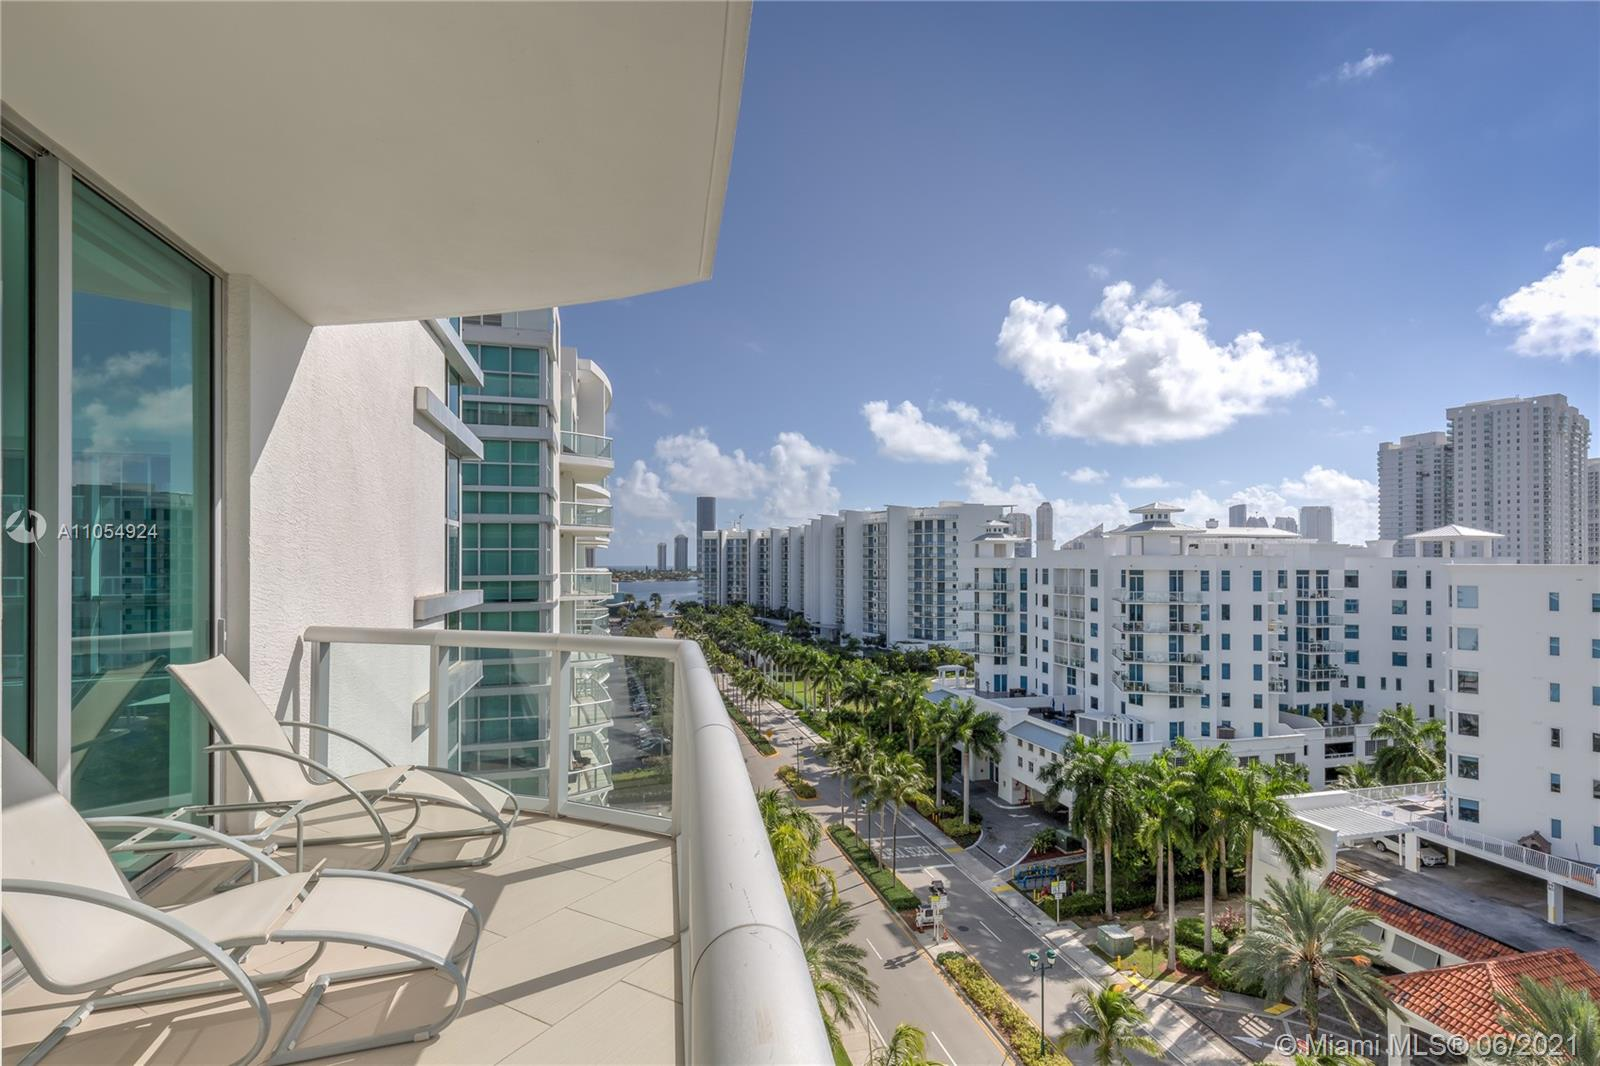 Photo of 3131 188th St #1-1007, Aventura, Florida, 33180 -